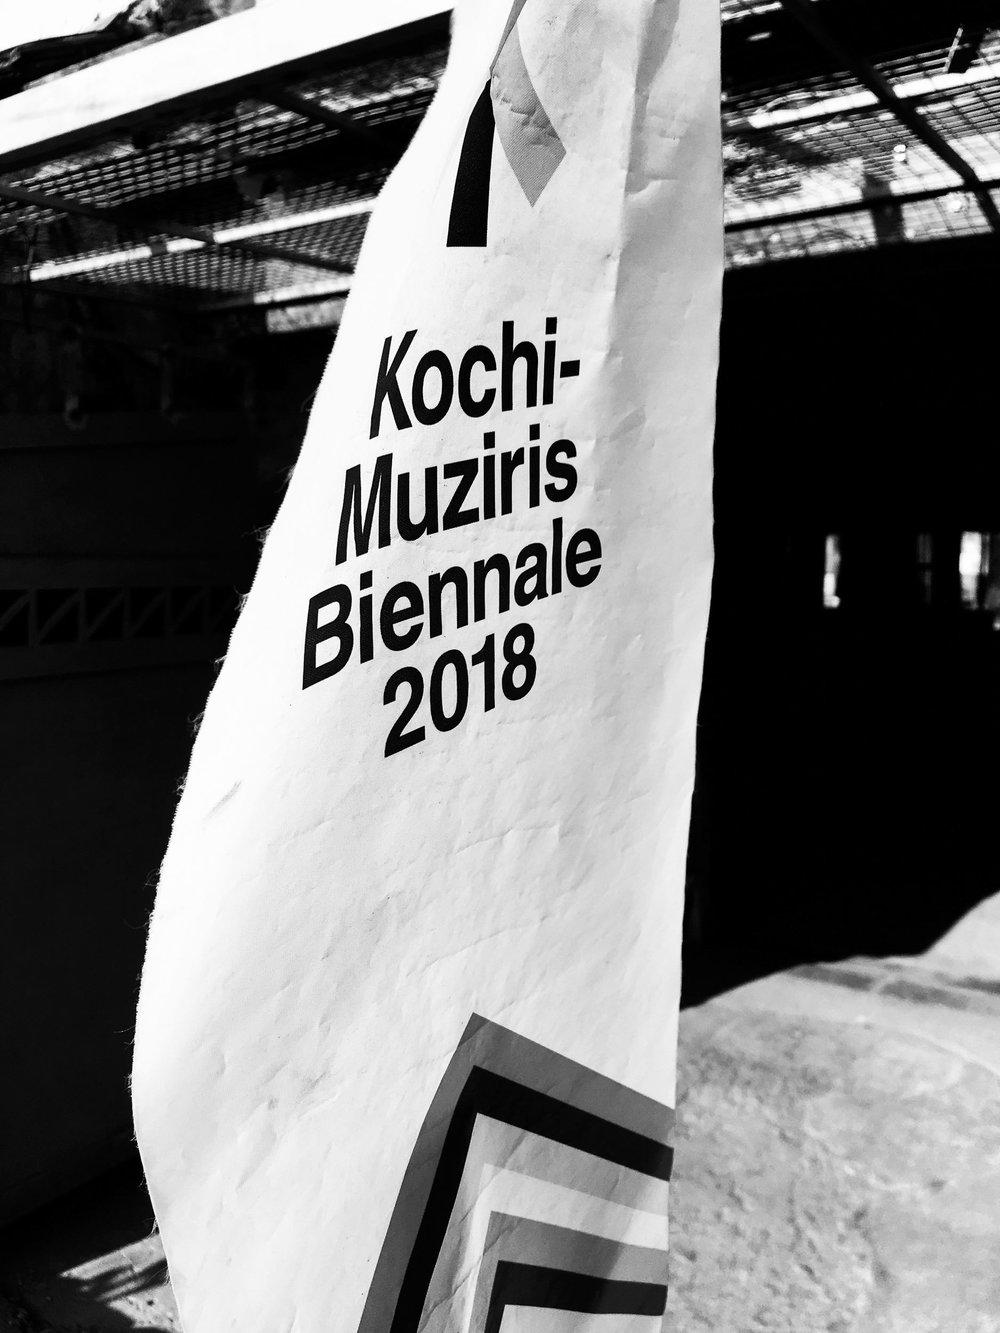 Sindhur_Photography_Kochi Muziris Biennale -2019-47.JPG